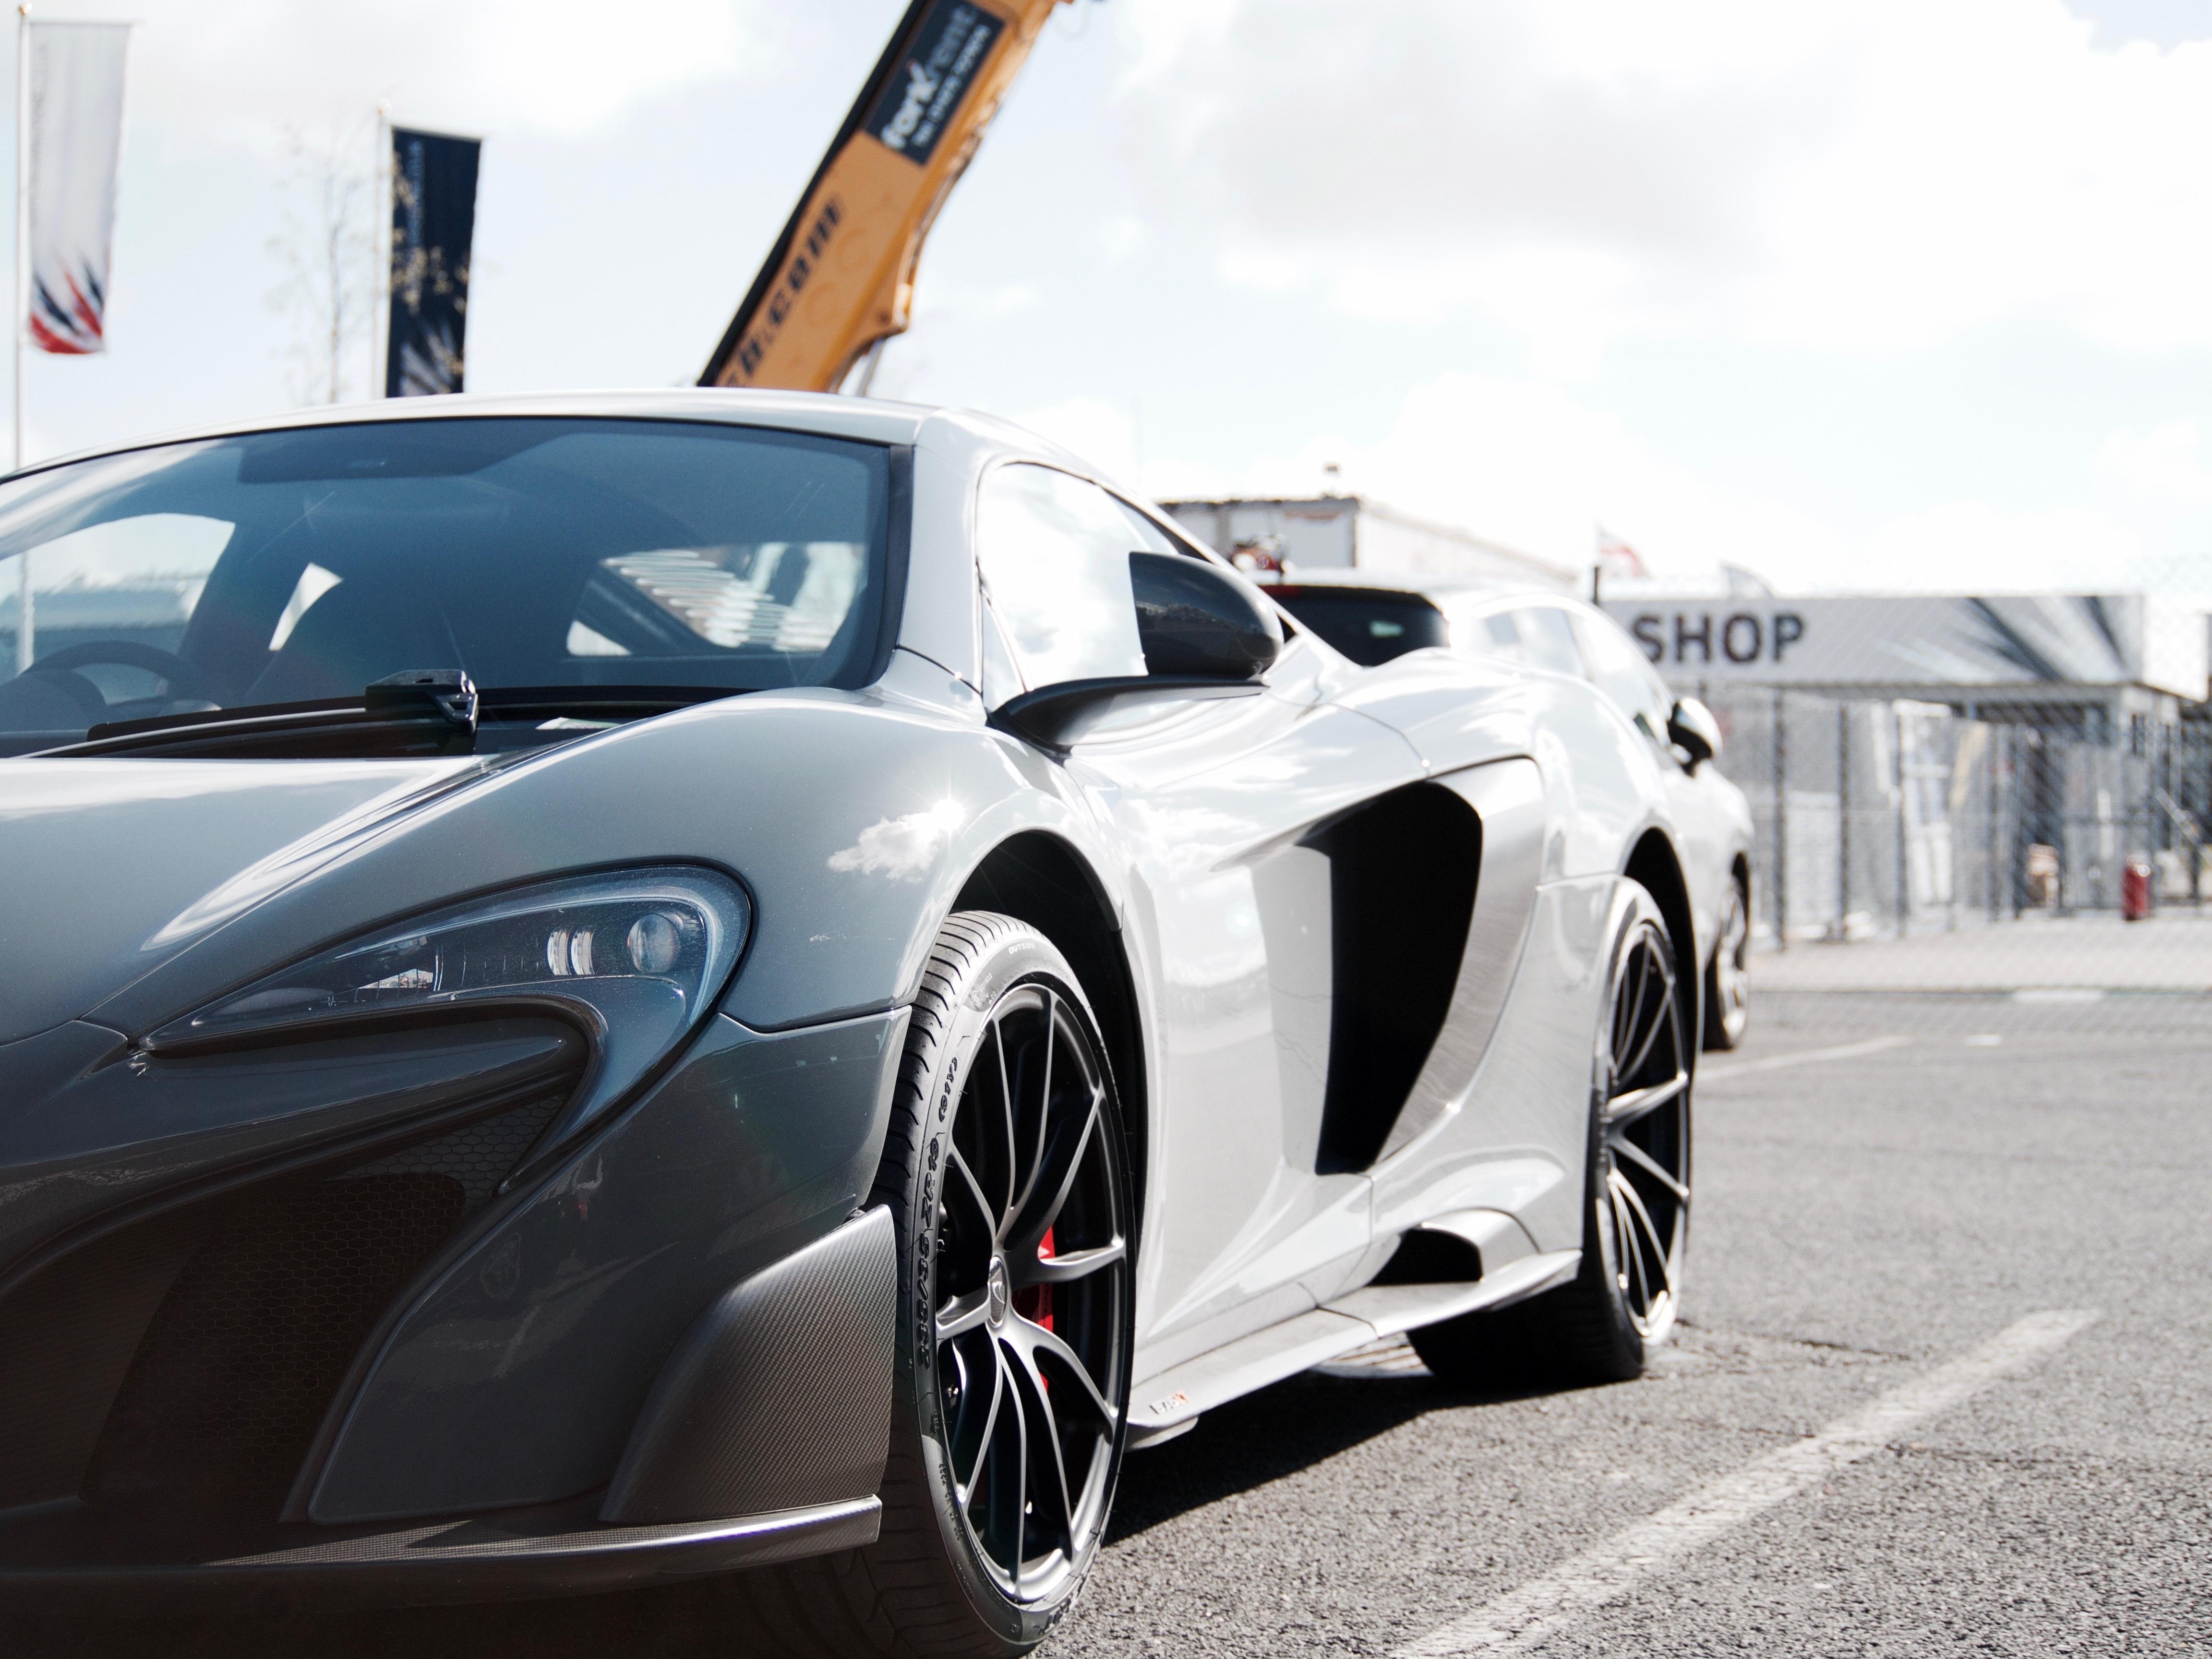 Free wheel sports car supercar land vehicle automobile